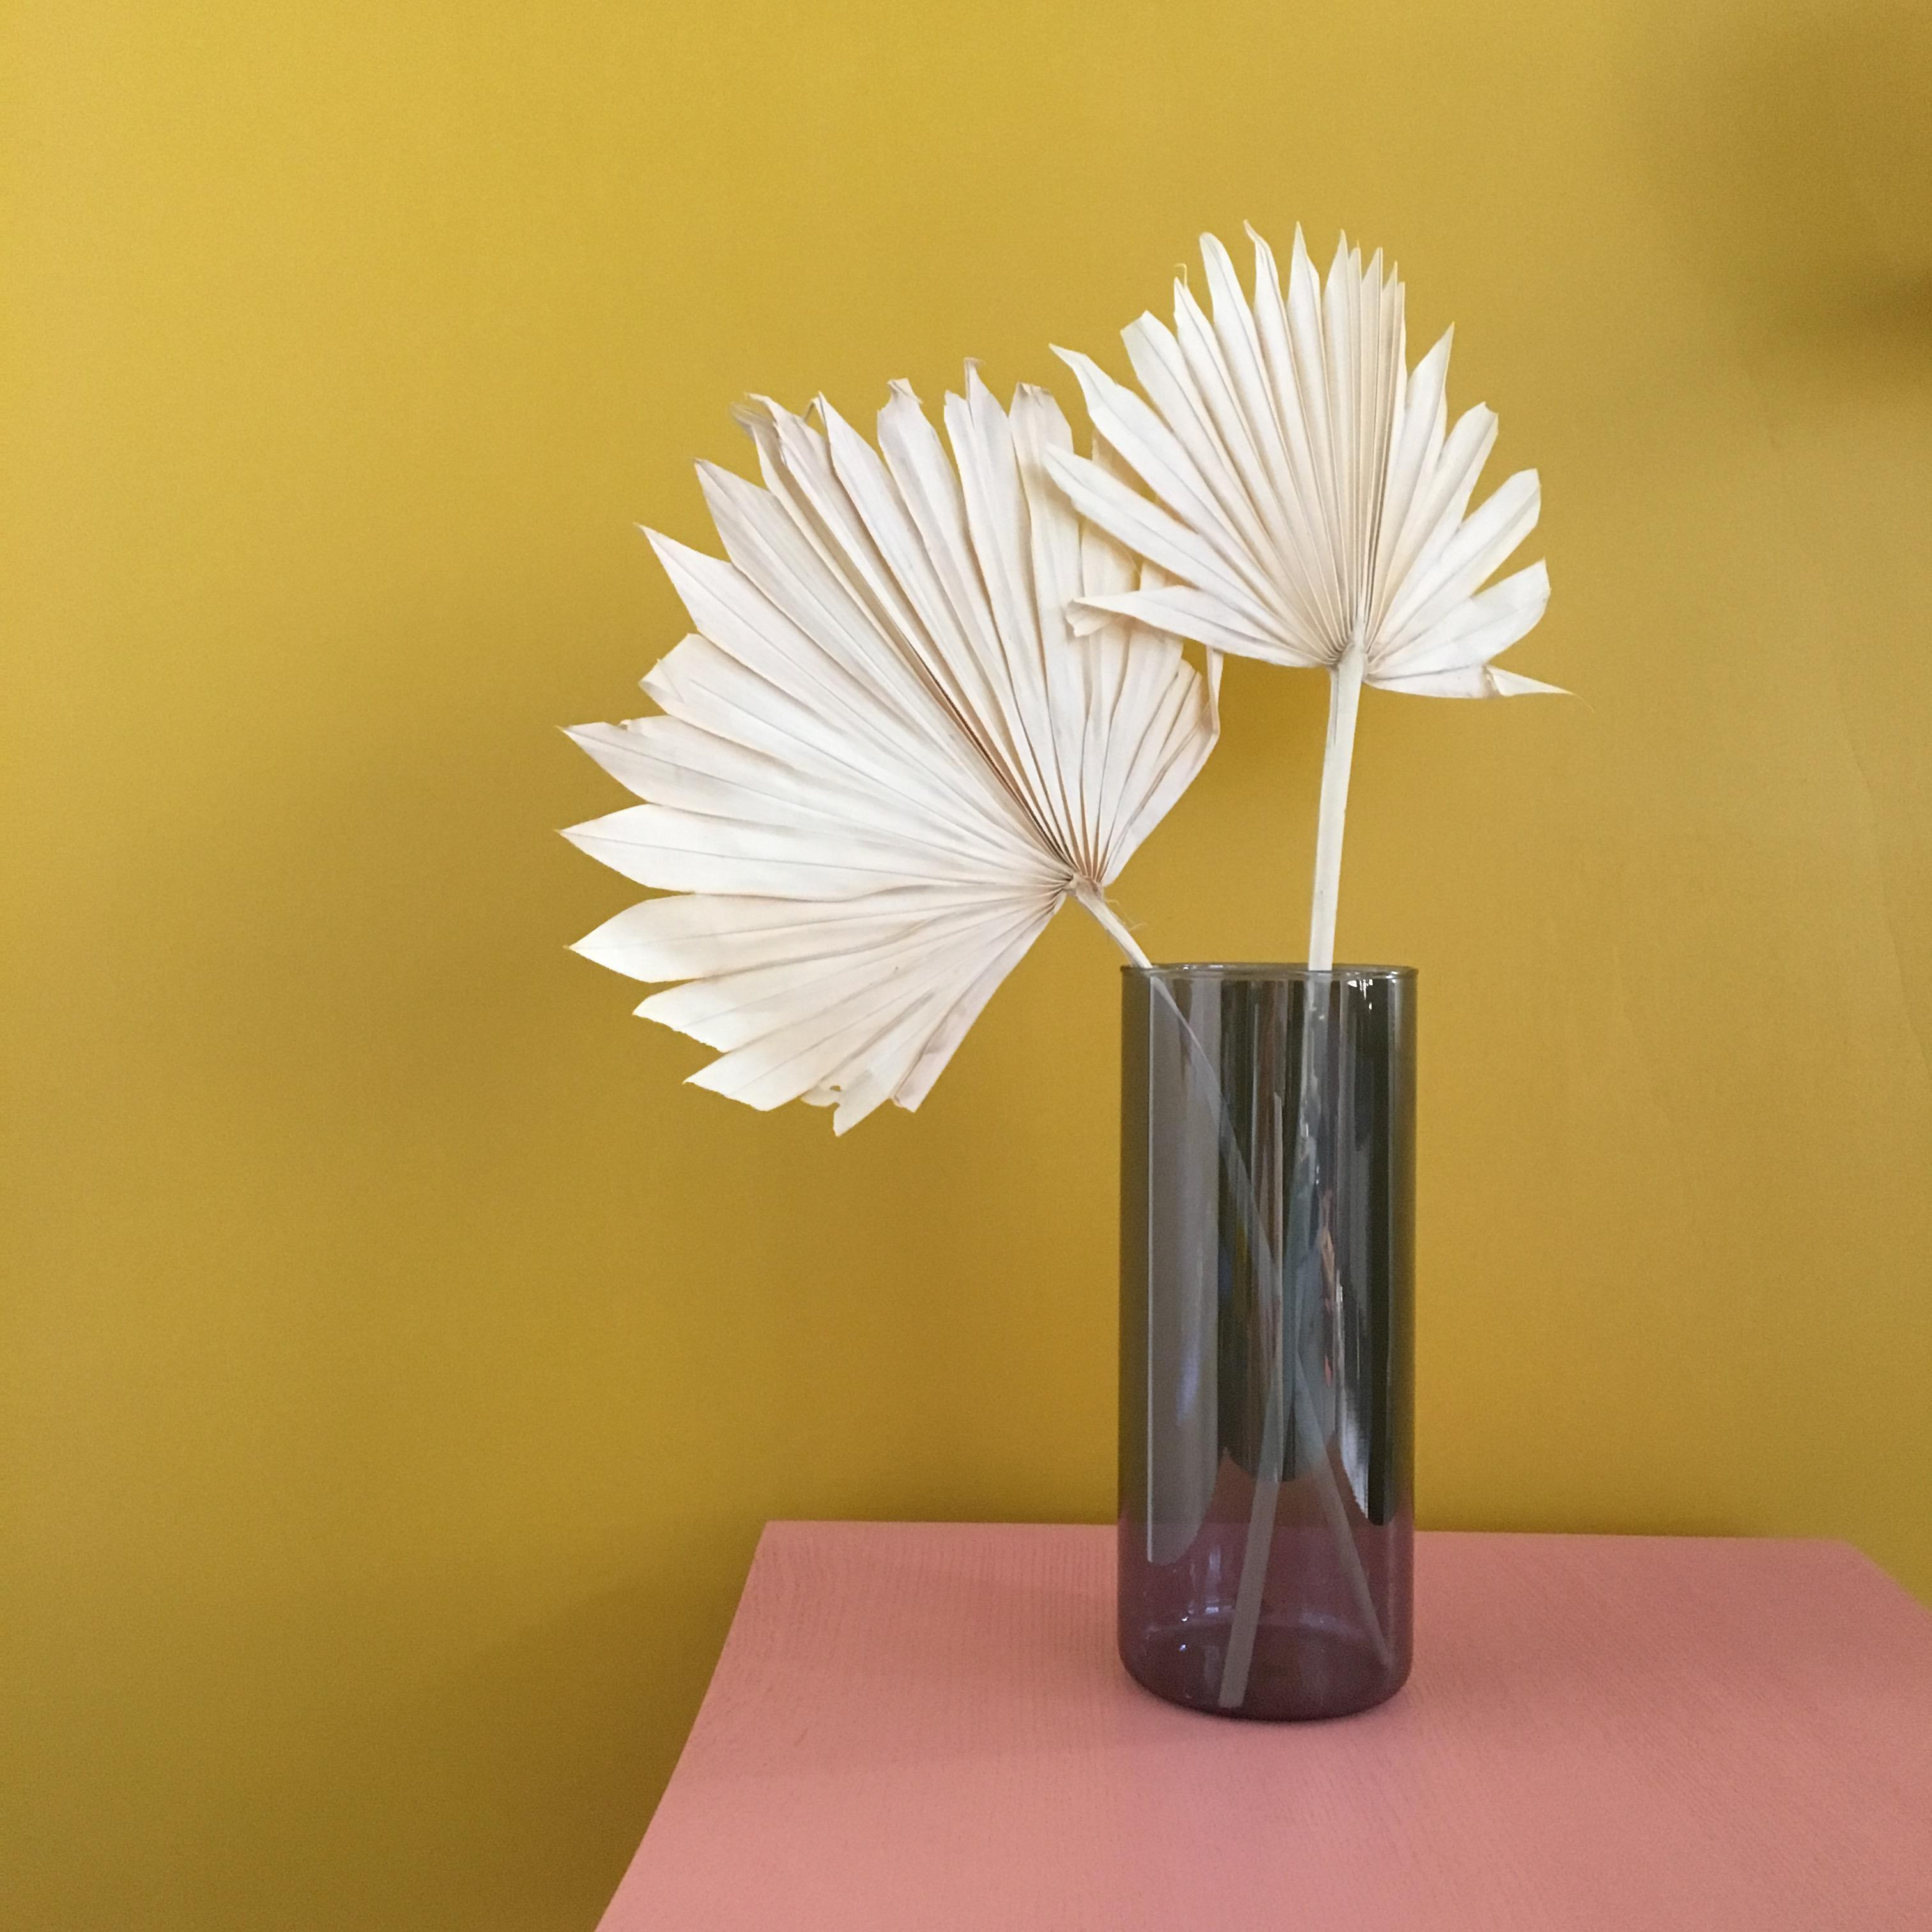 Senfgelbe Wandfarbe Bilder Ideen Couch